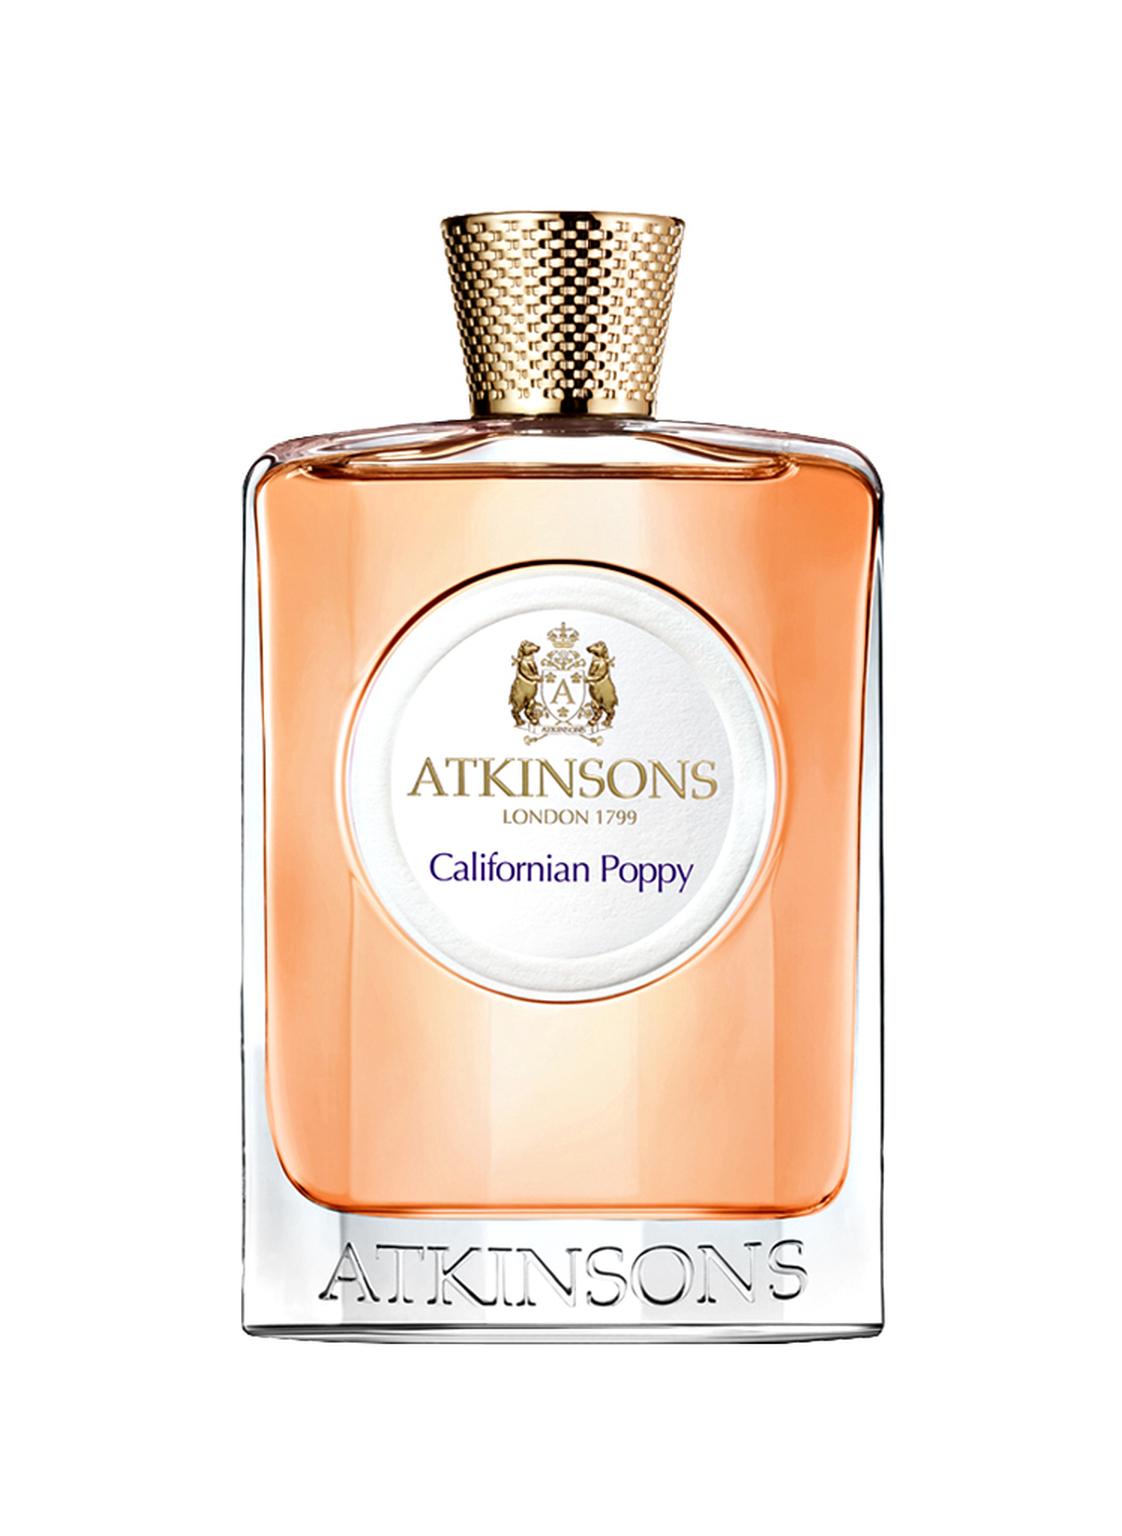 Image of Atkinsons California Poppy Eau de Toilette 100 ml